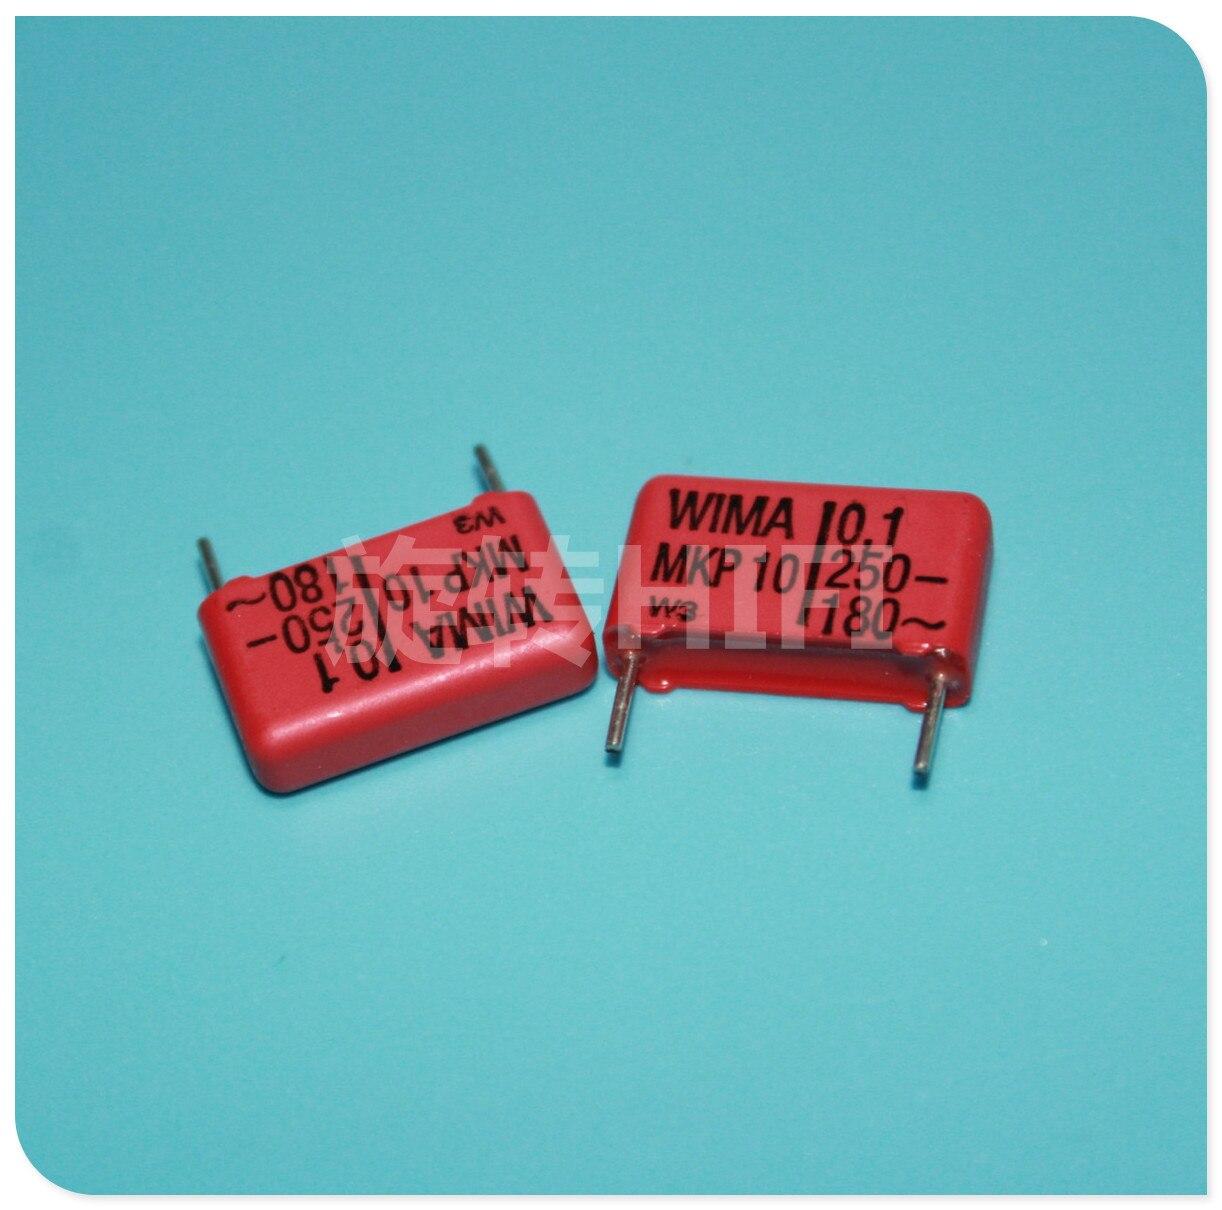 10 Uds rojo WIMA MKP10 0,1 UF 250V p15mm original nuevo MKP-10 104/250V audio 100nf película 104 PCM15 gran oferta 100NF/250V